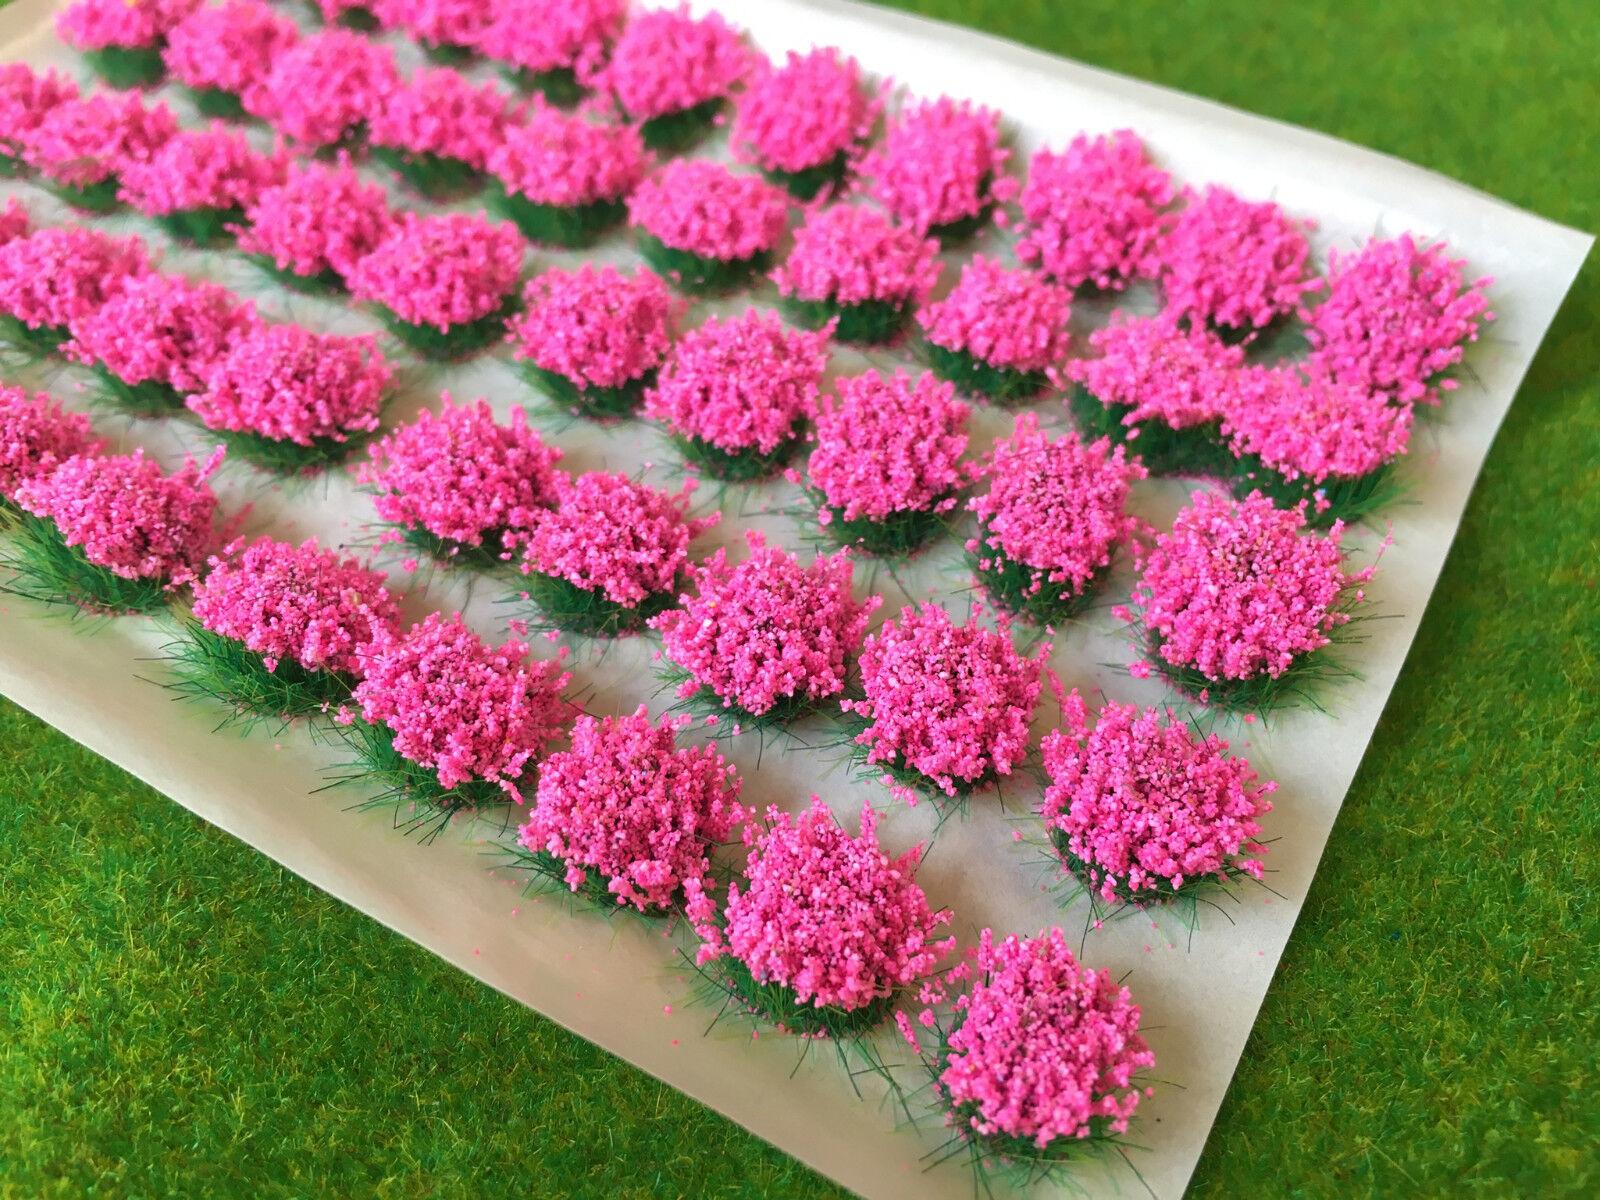 Large Pink Flower Tufts - Model Scenery Static Grass Warhammer Wargame Railway